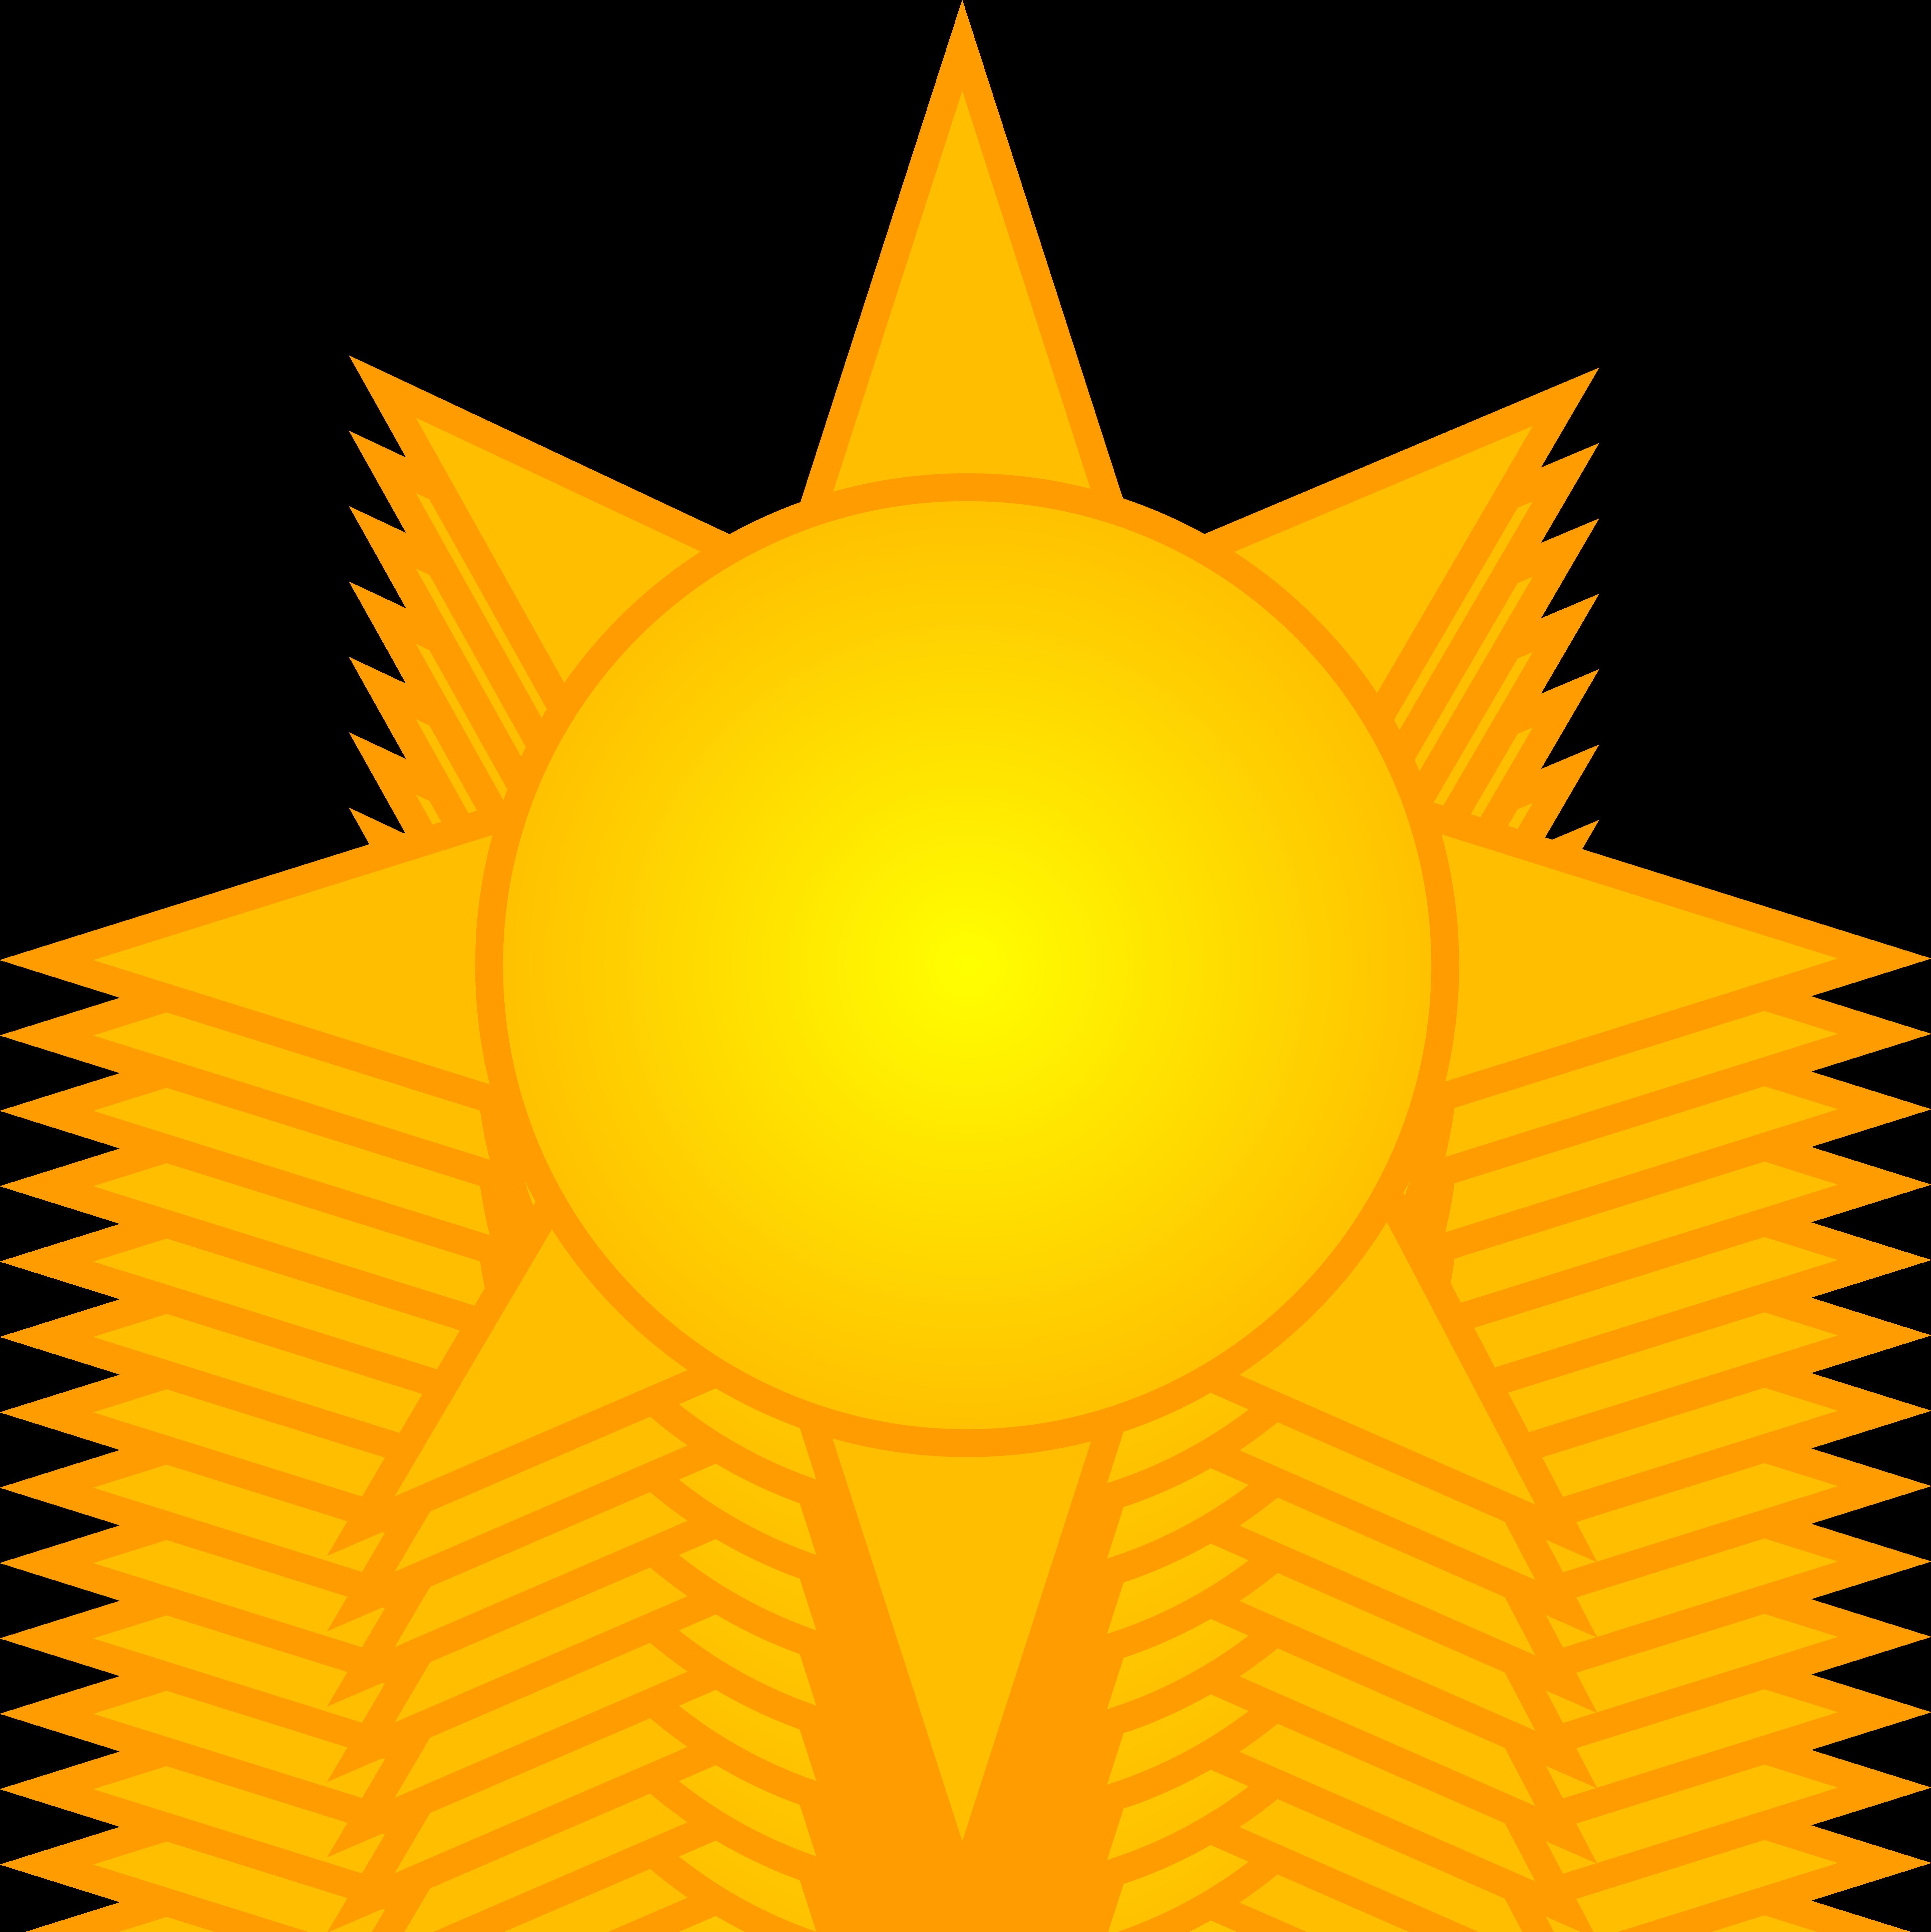 free sun clipart images free clip art [ 5789 x 5793 Pixel ]